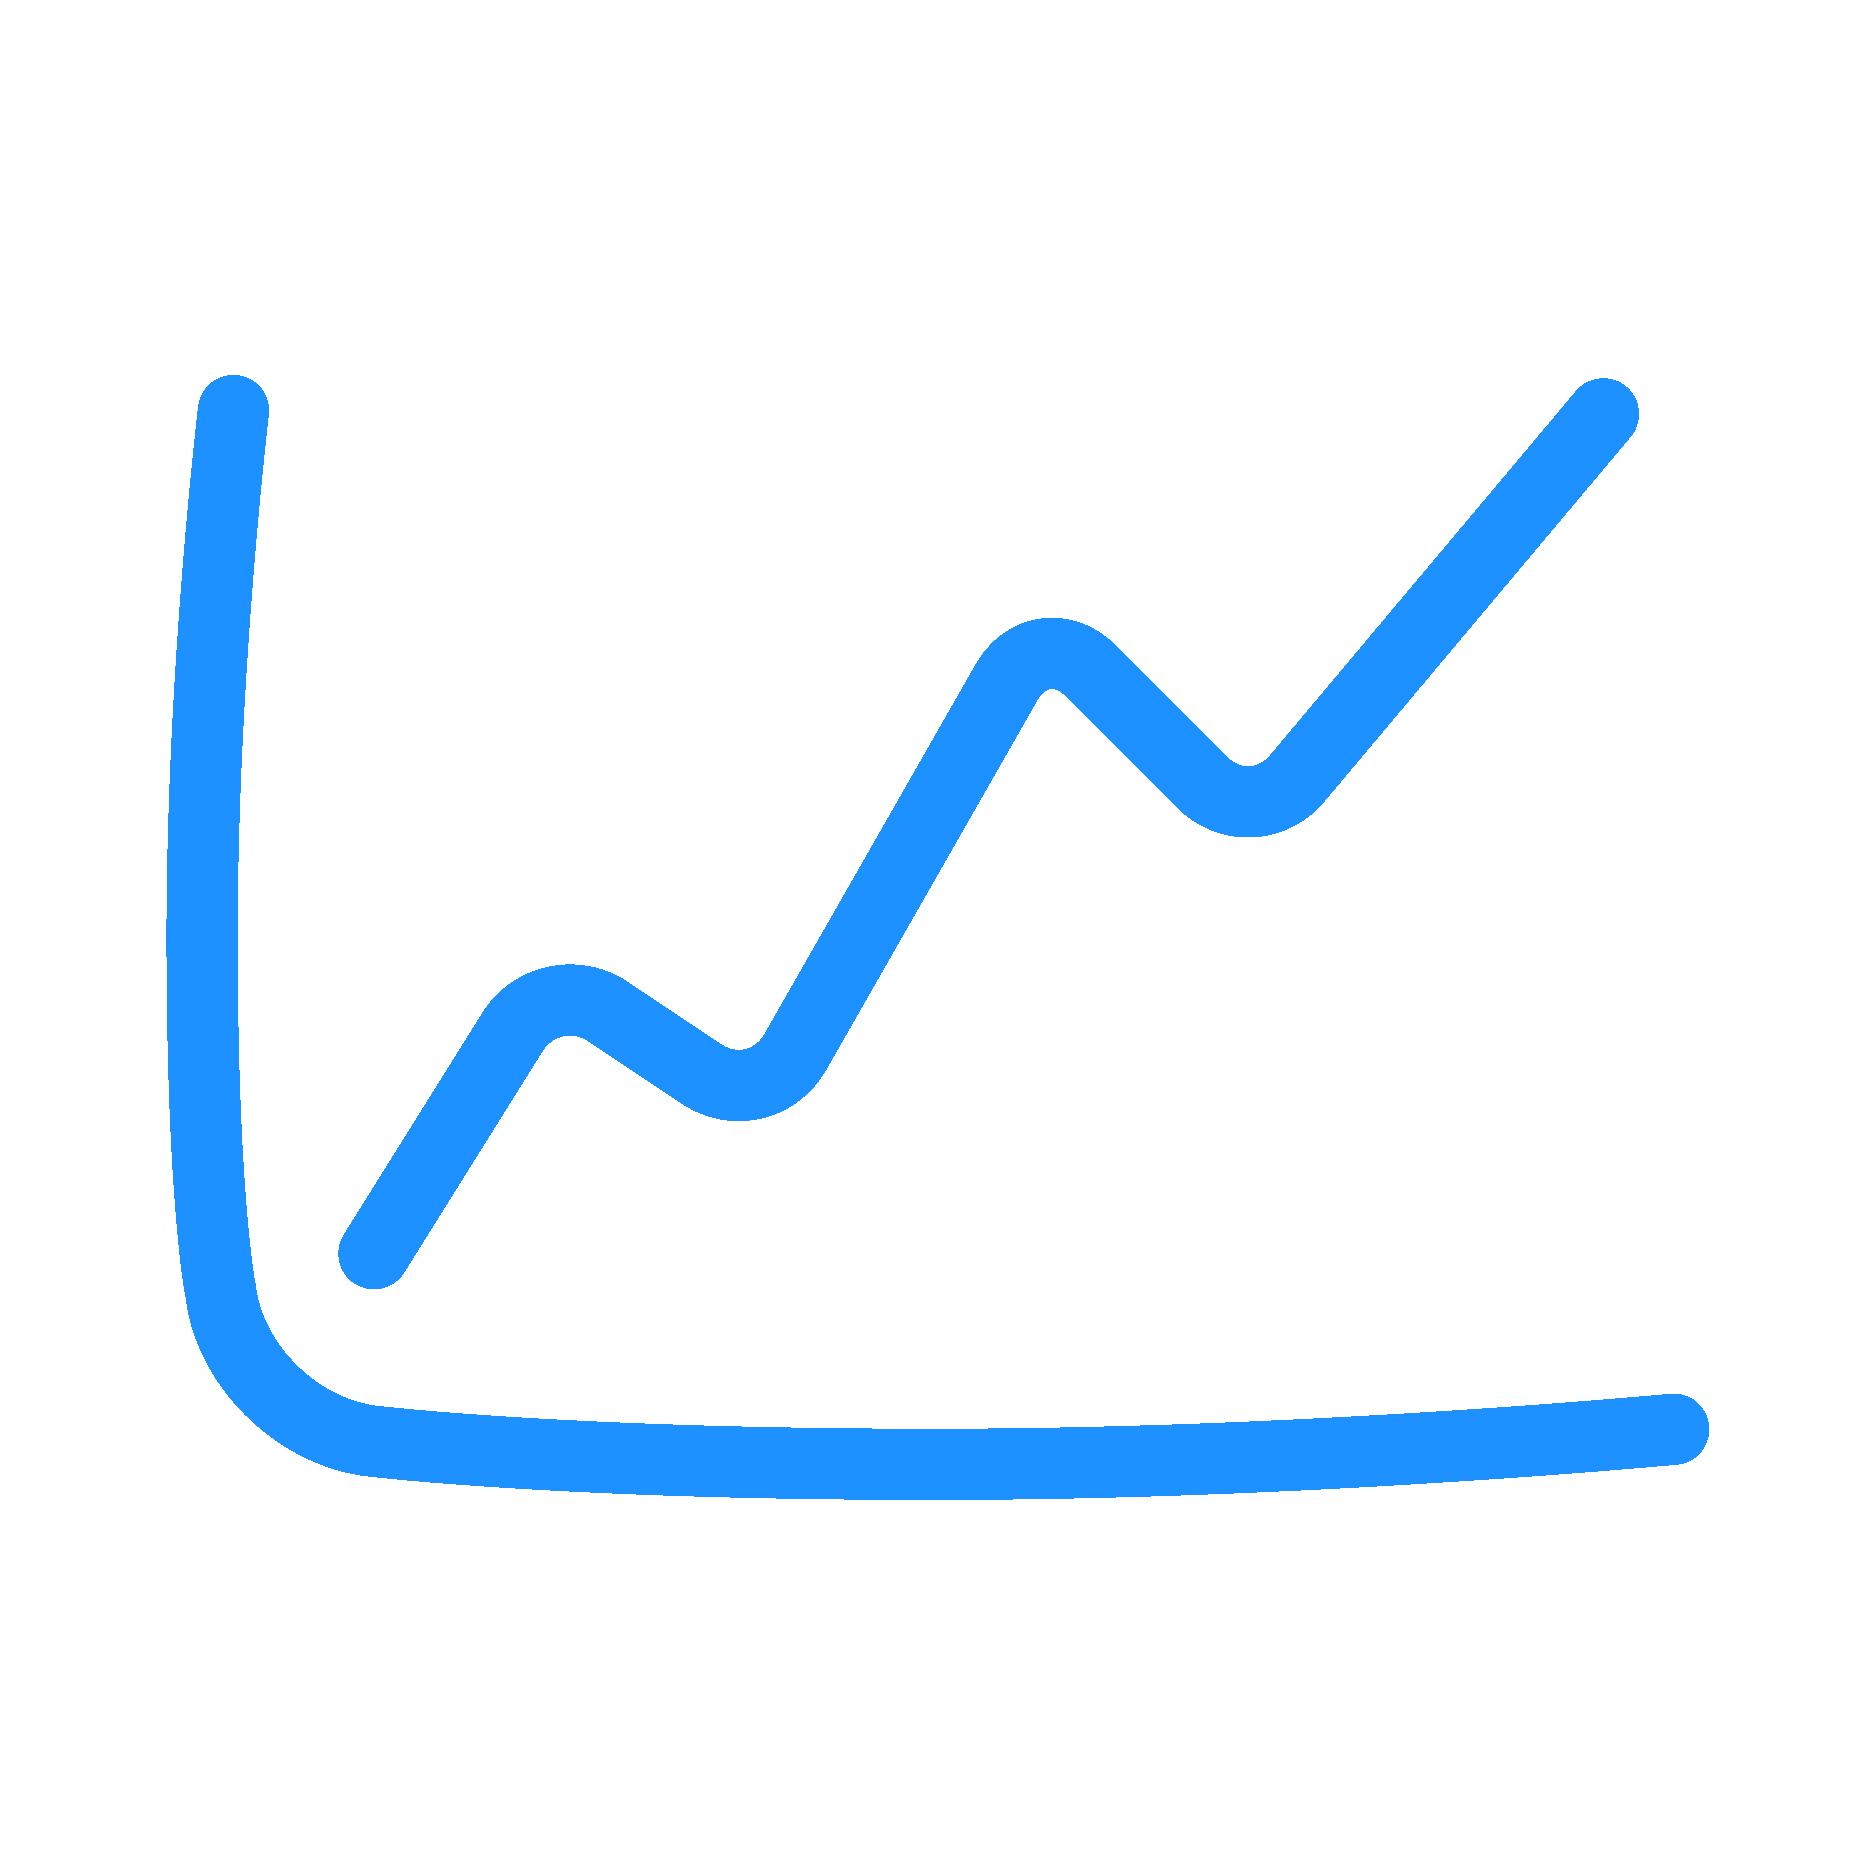 Blauer Chart